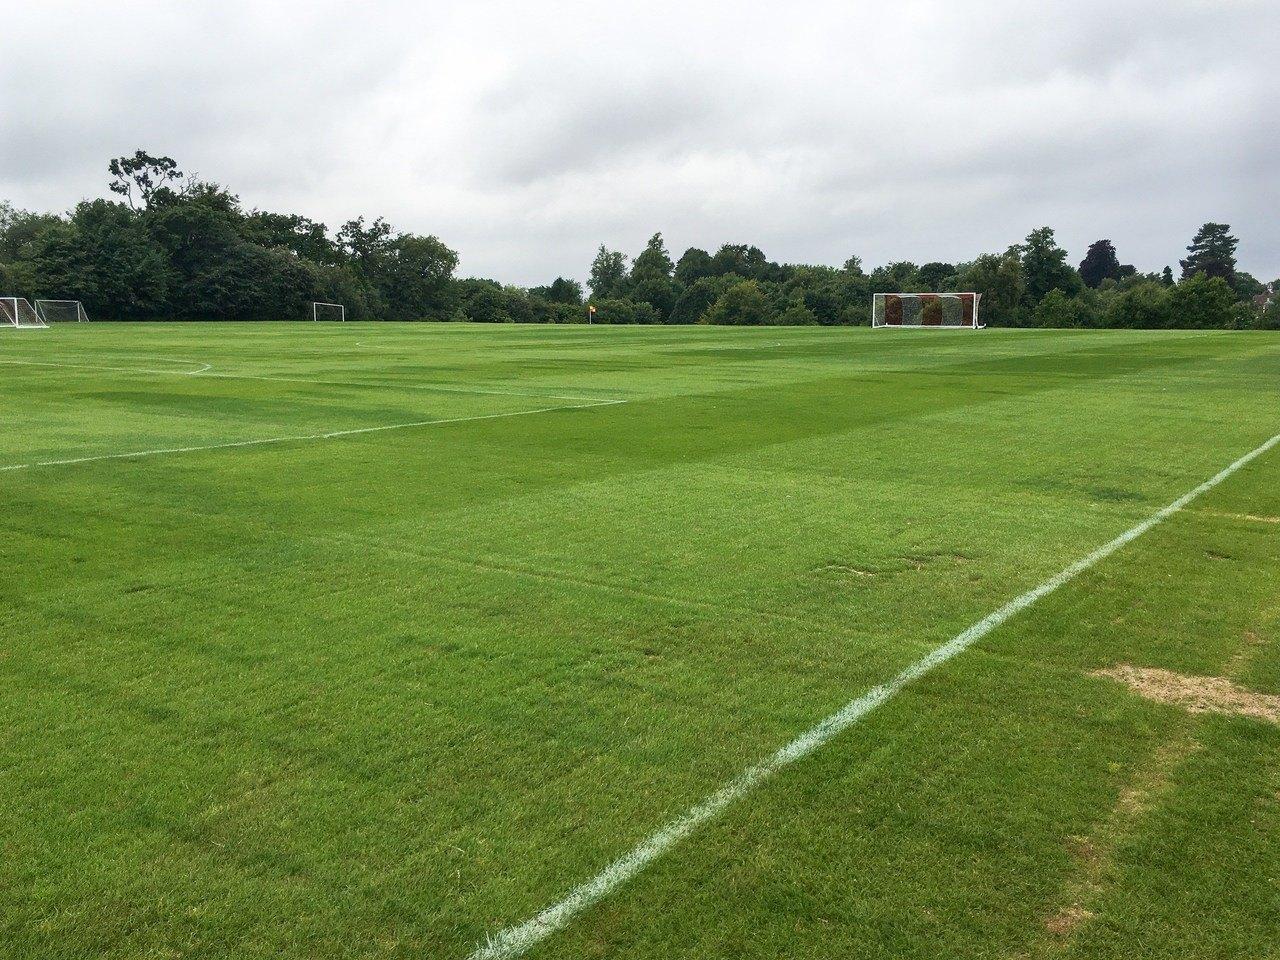 Dukes Meadow Sevenoaks School After Image